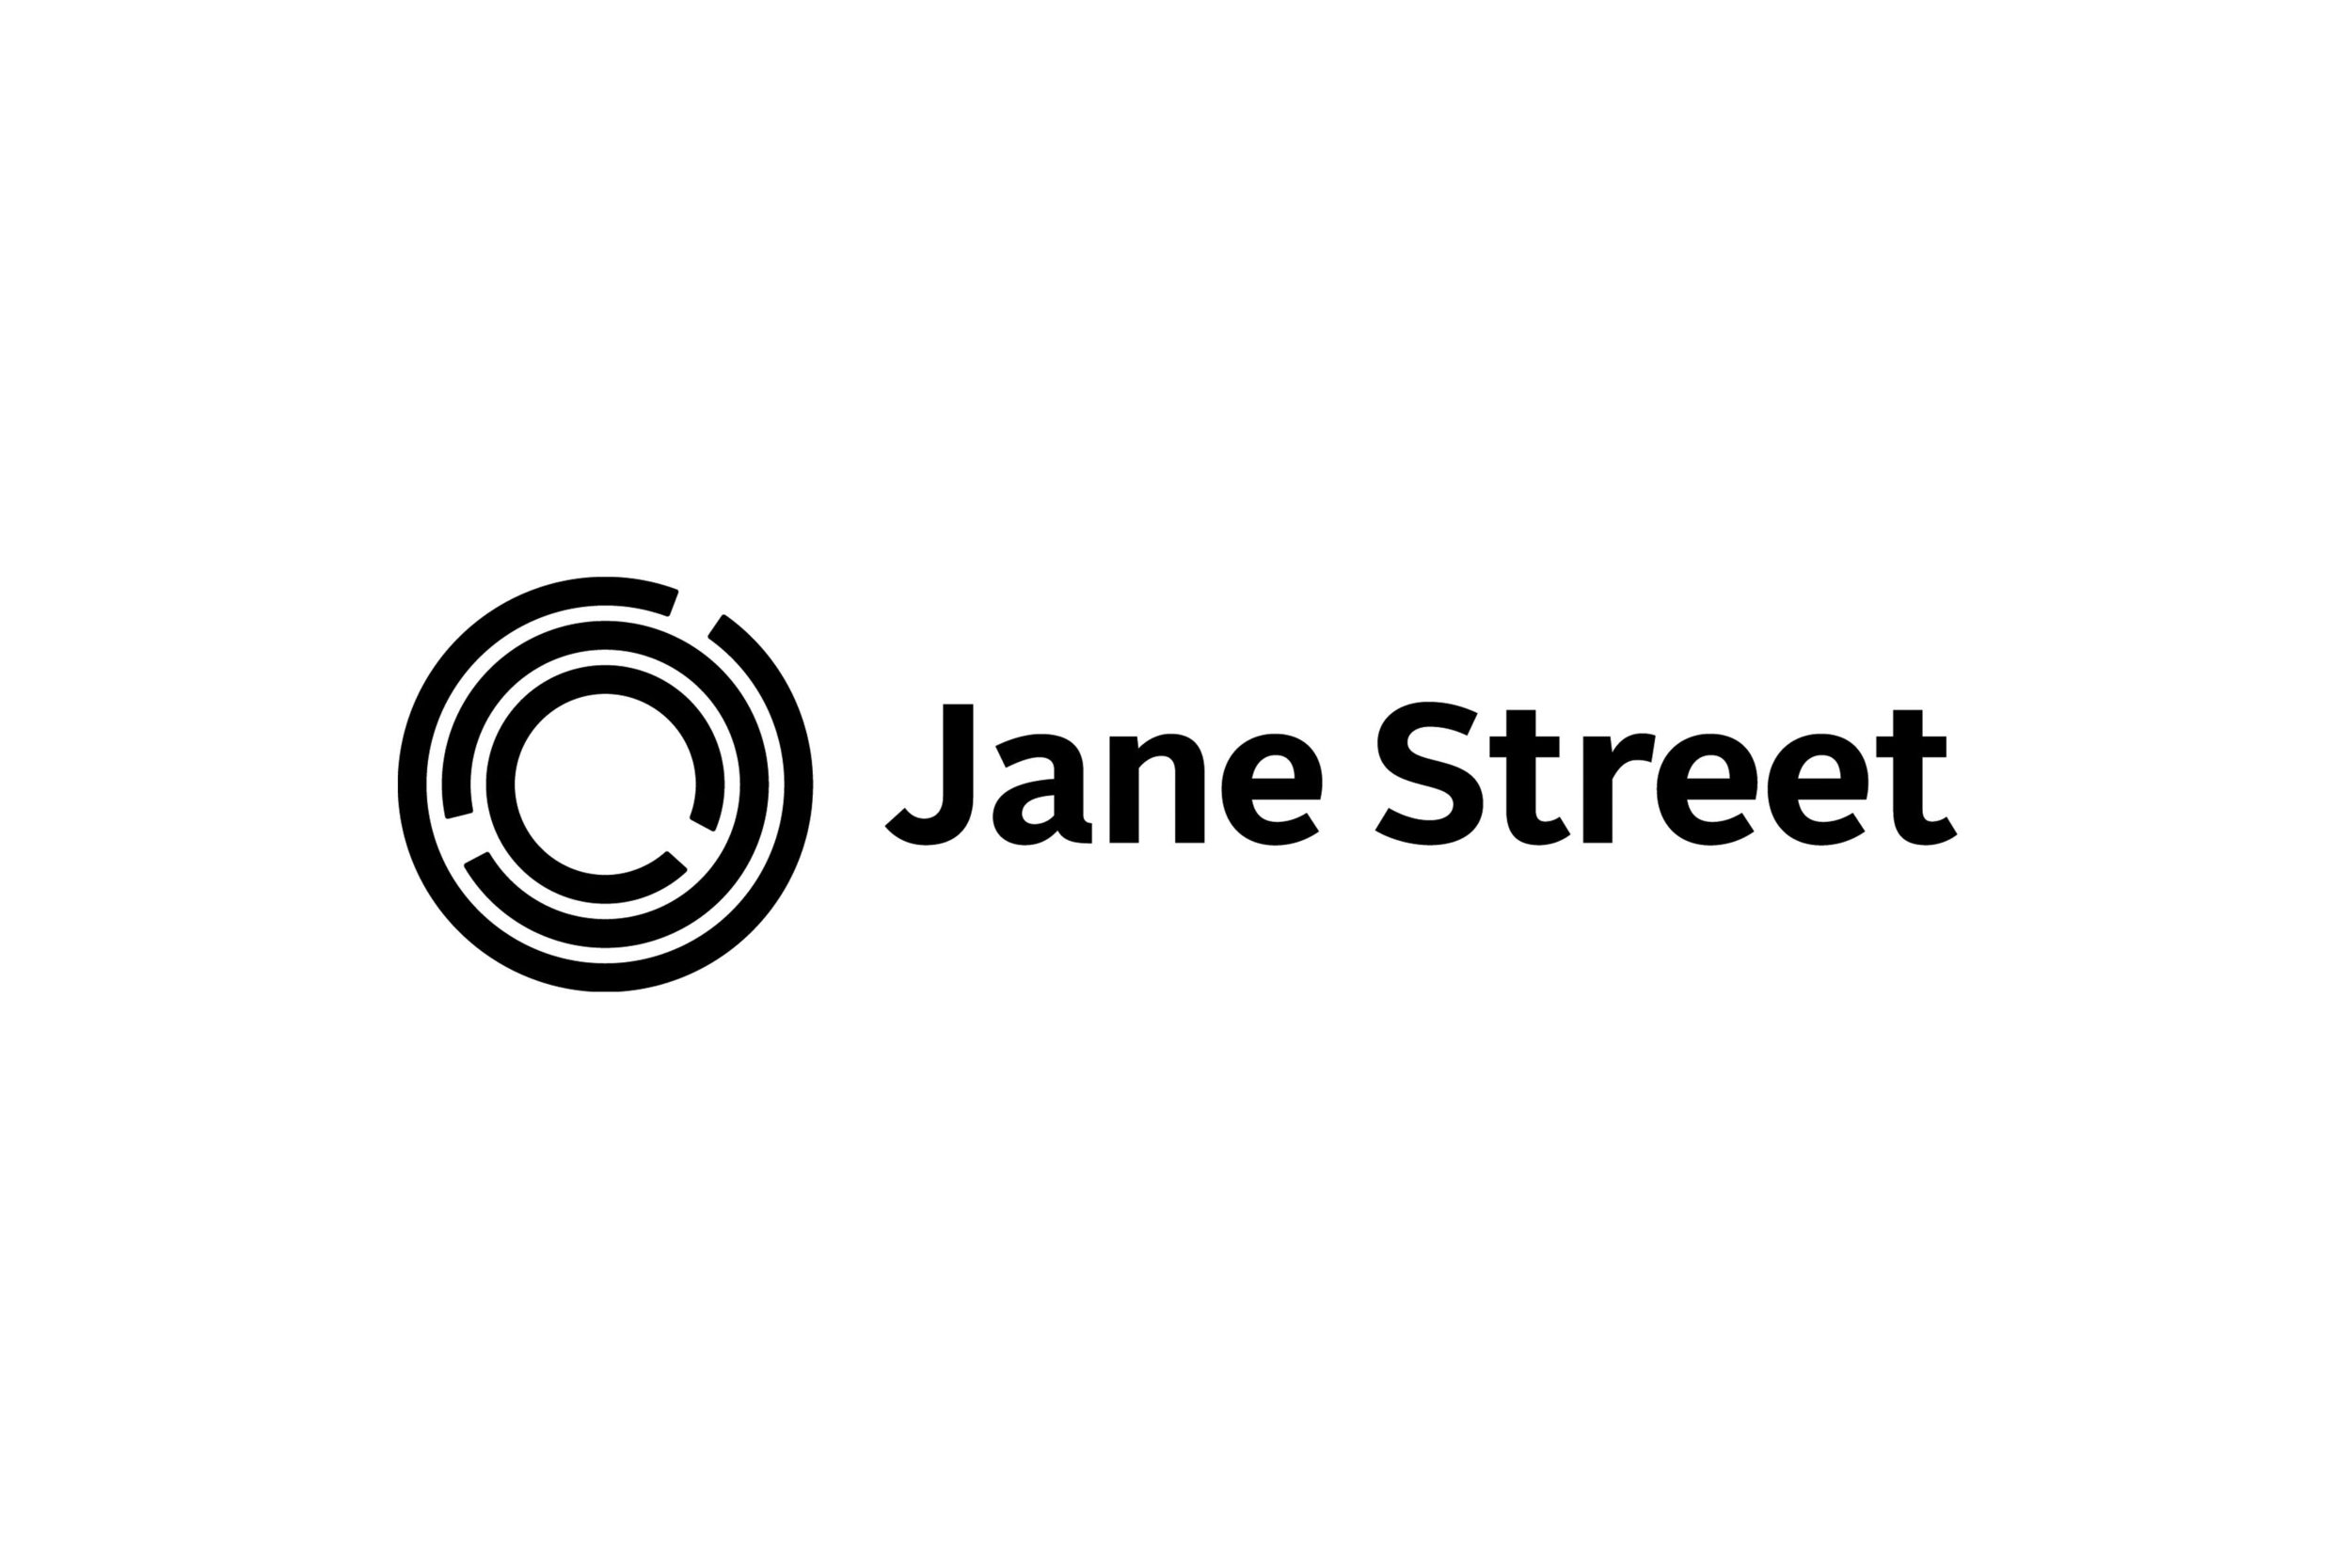 Untitled1_0000s_0016_JEB-ClientLogos_0001s_0016_Jane_Street_Logo_Horizontal_.jpg.jpg.jpg